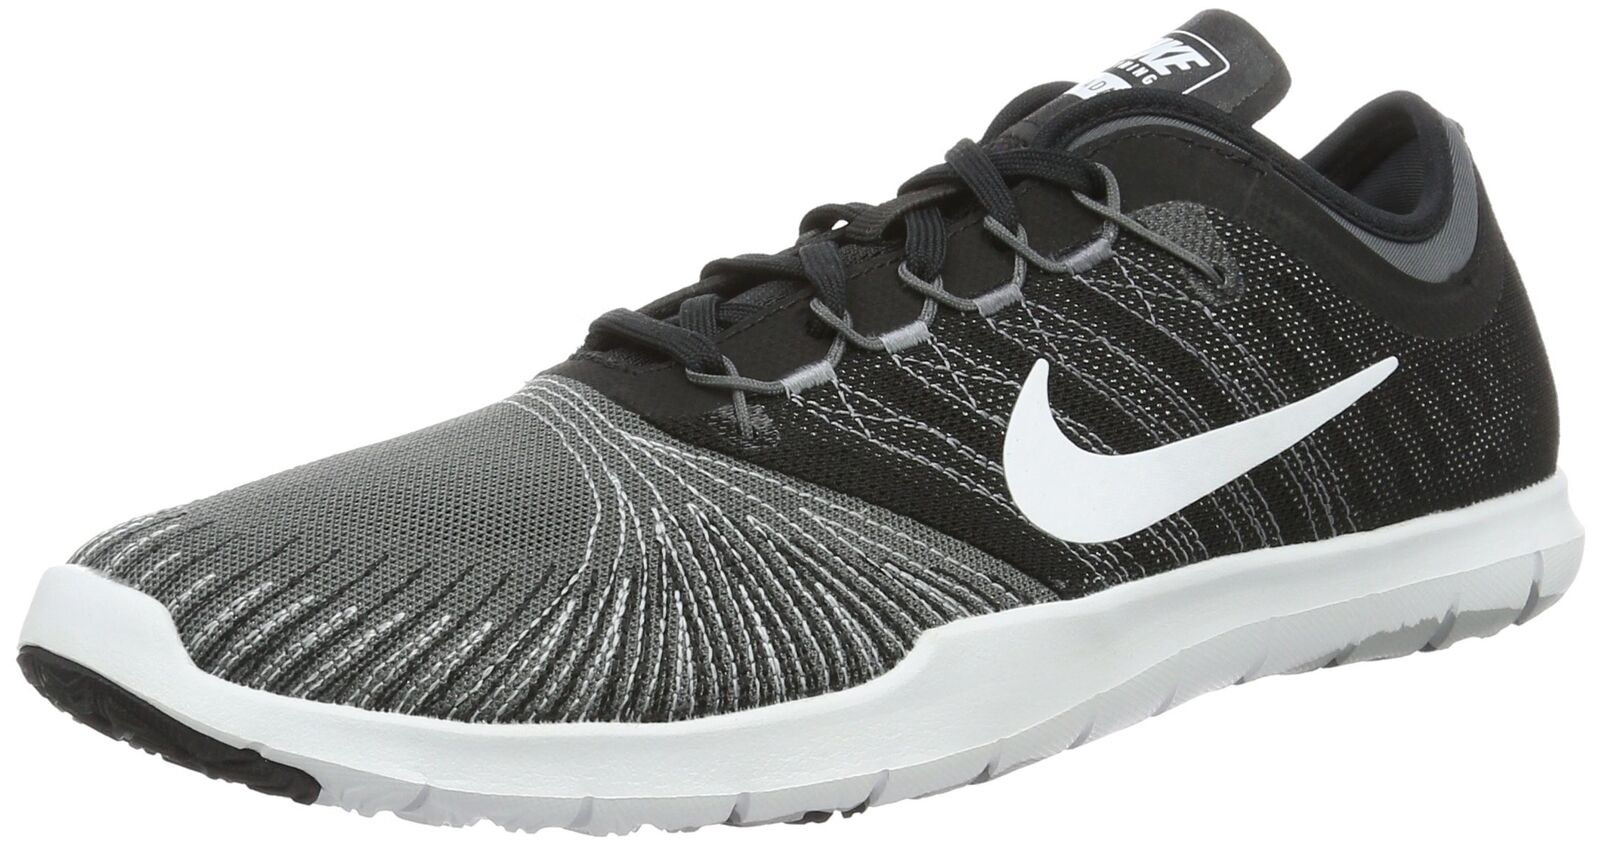 NIKE Women's Flex Adapt Tr Tr Tr Cross Trainer Shoes Dark Grey/White/Black/Stealth sz9 daa548